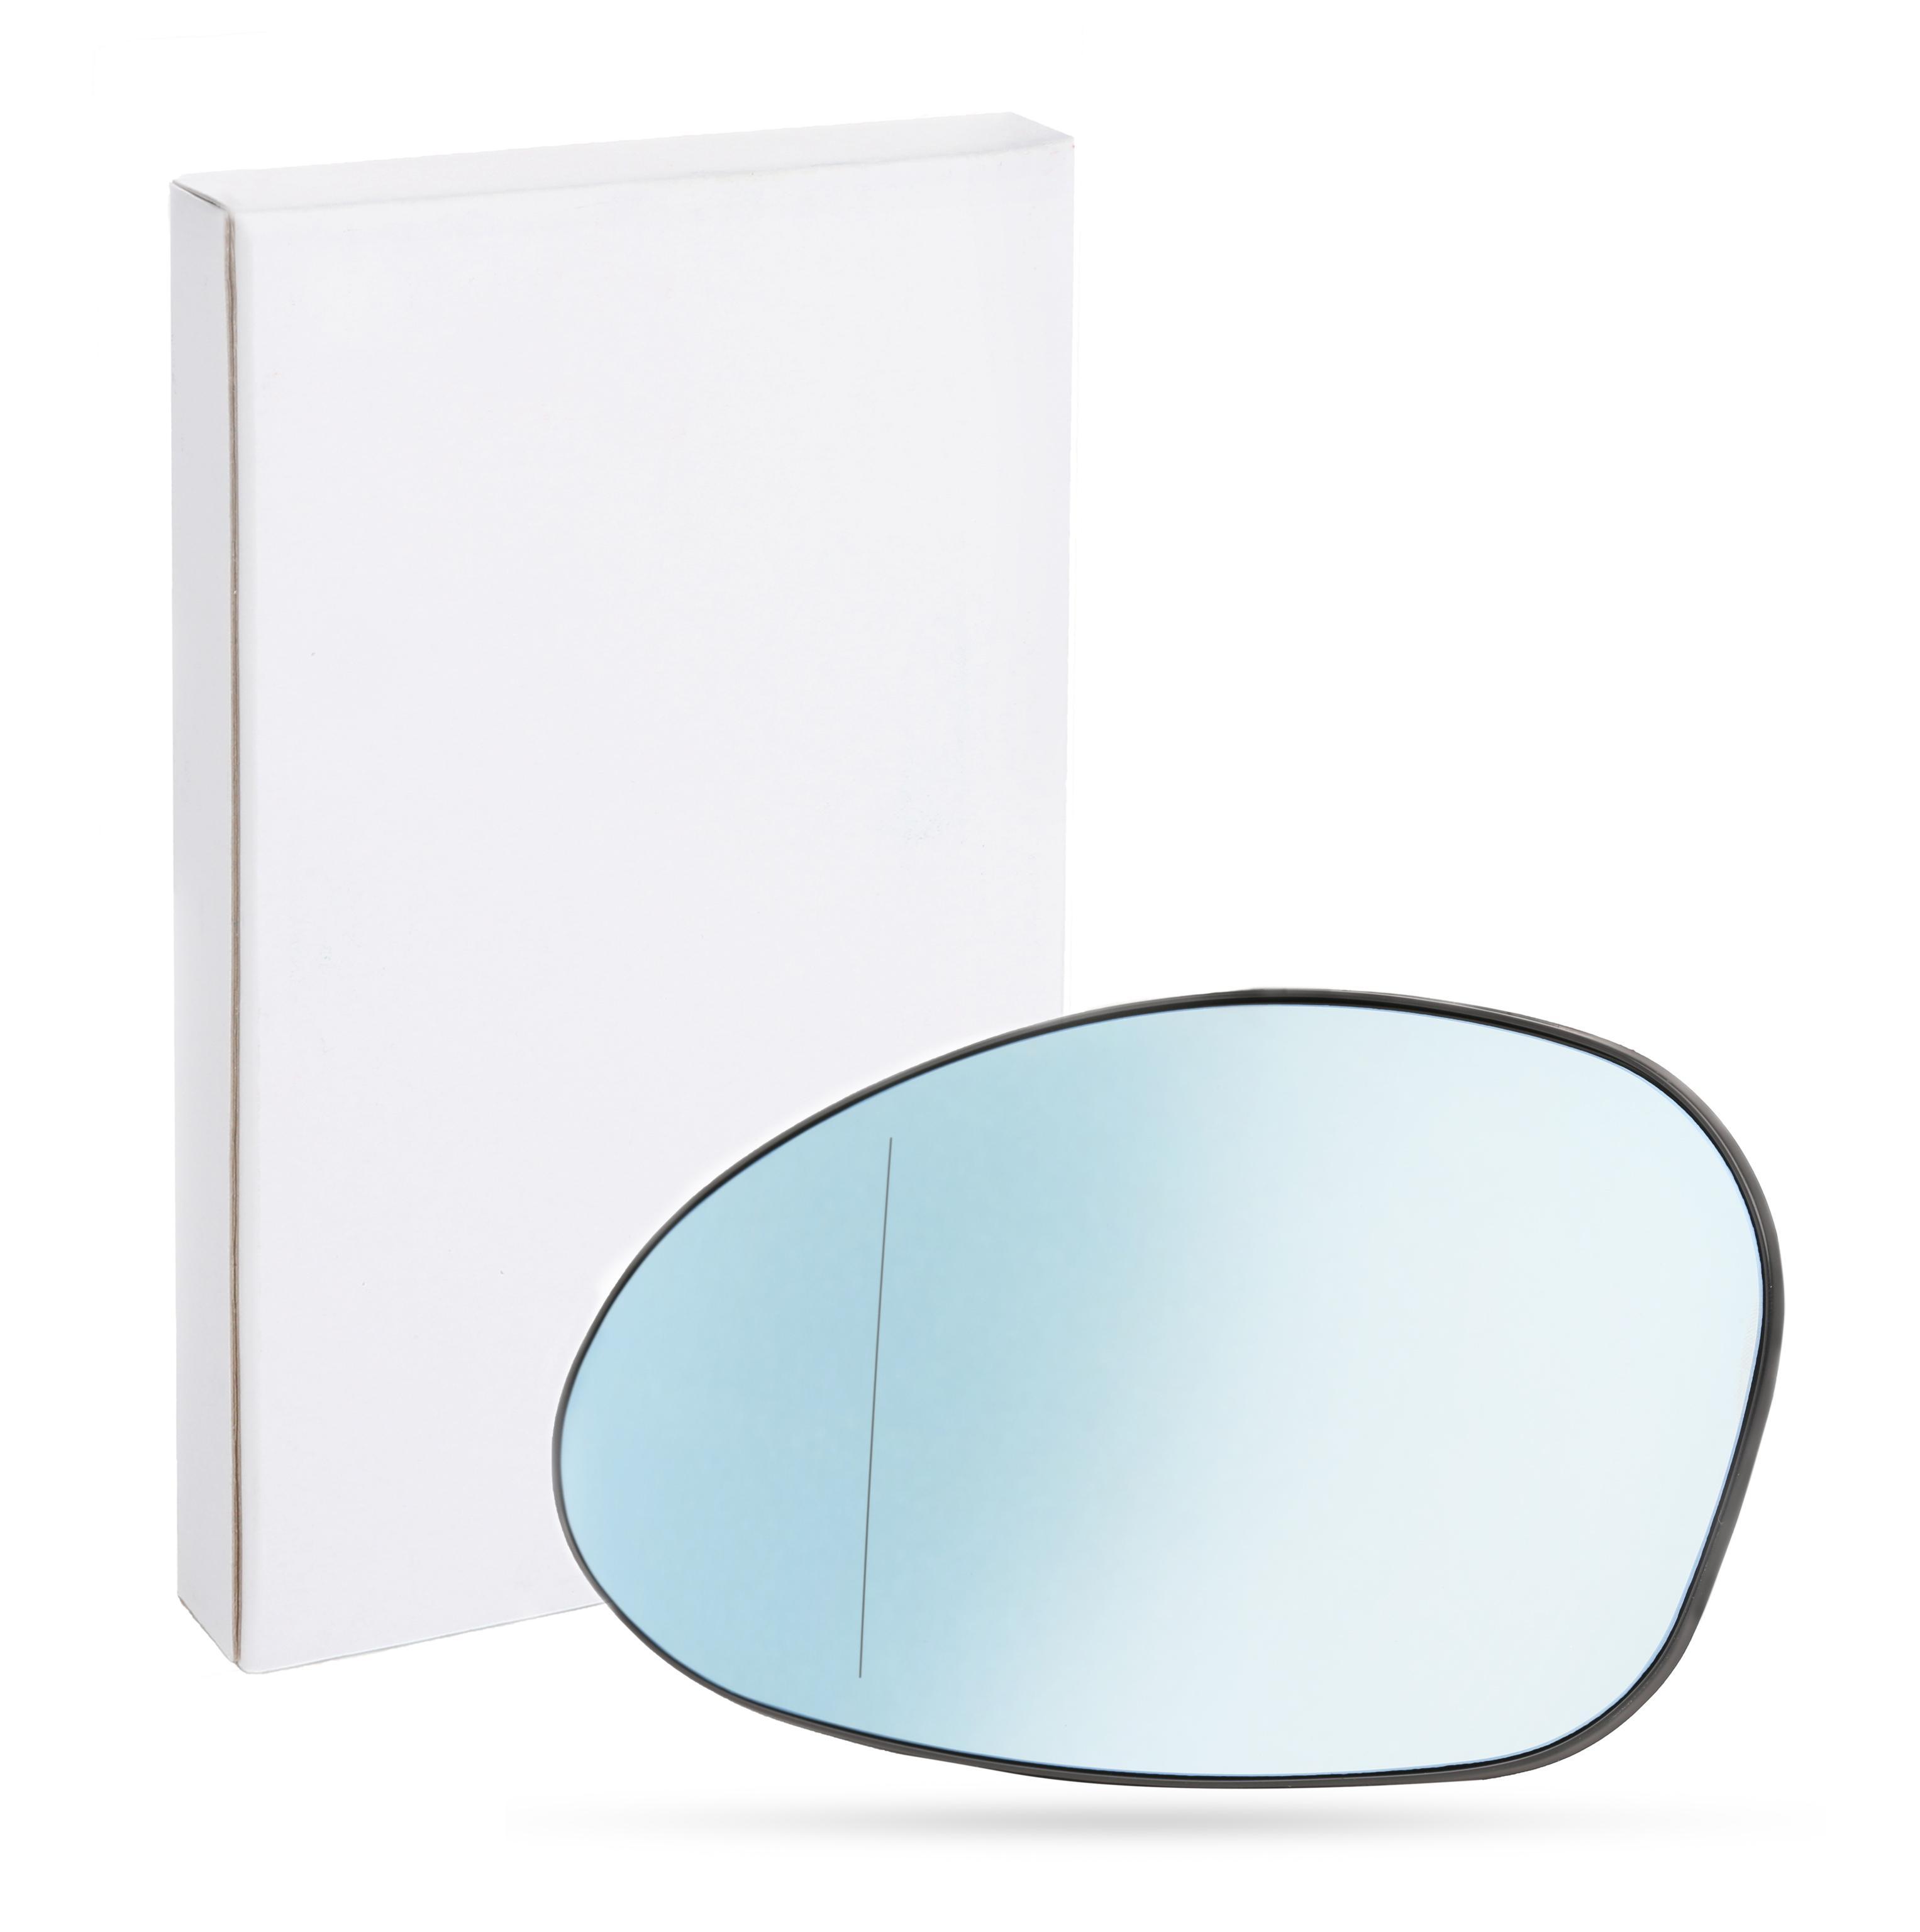 OE Original Spiegelglas 20 01 37-81 JOHNS